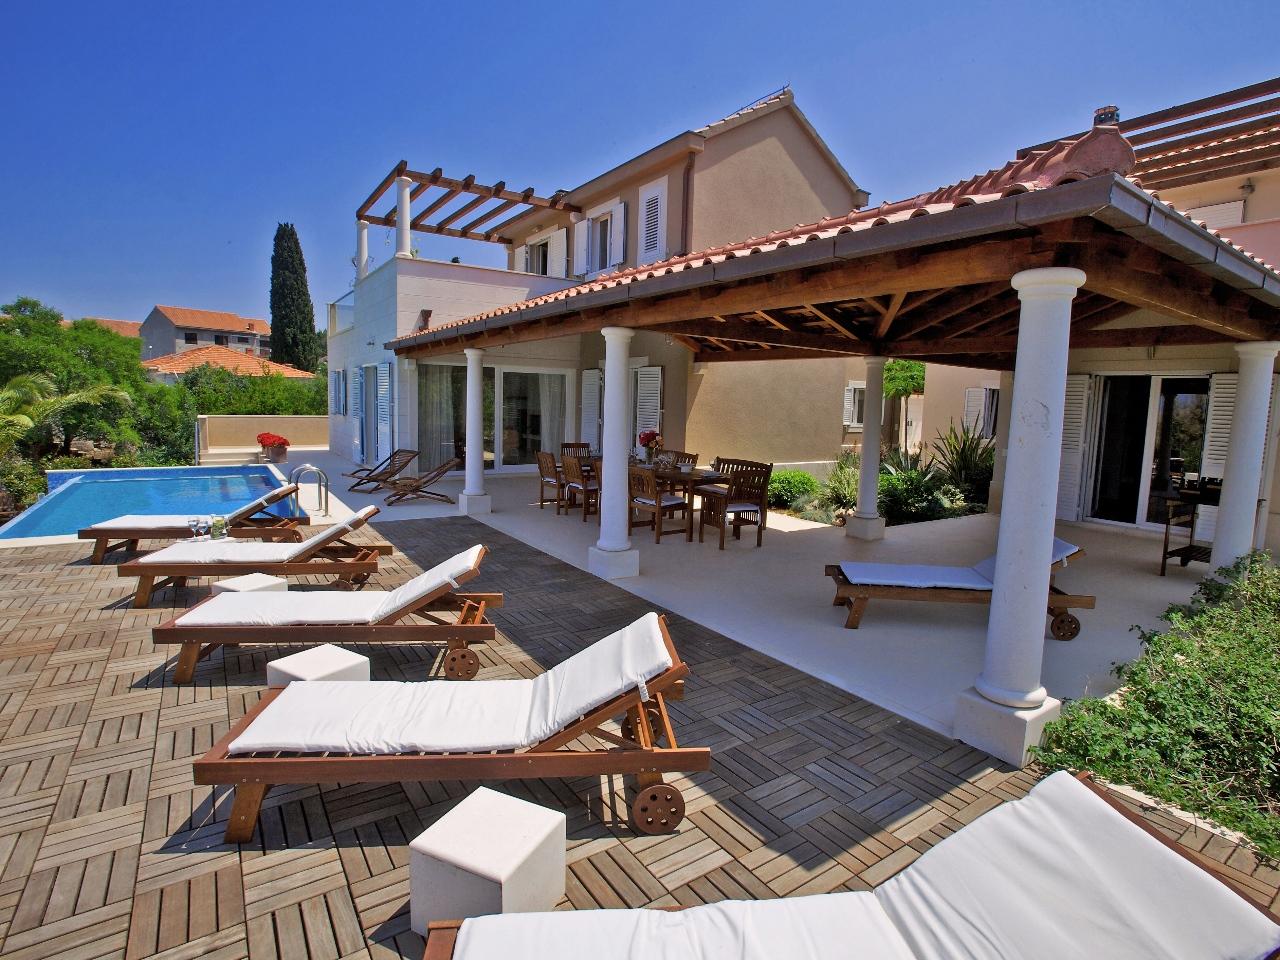 Villa Gumonca